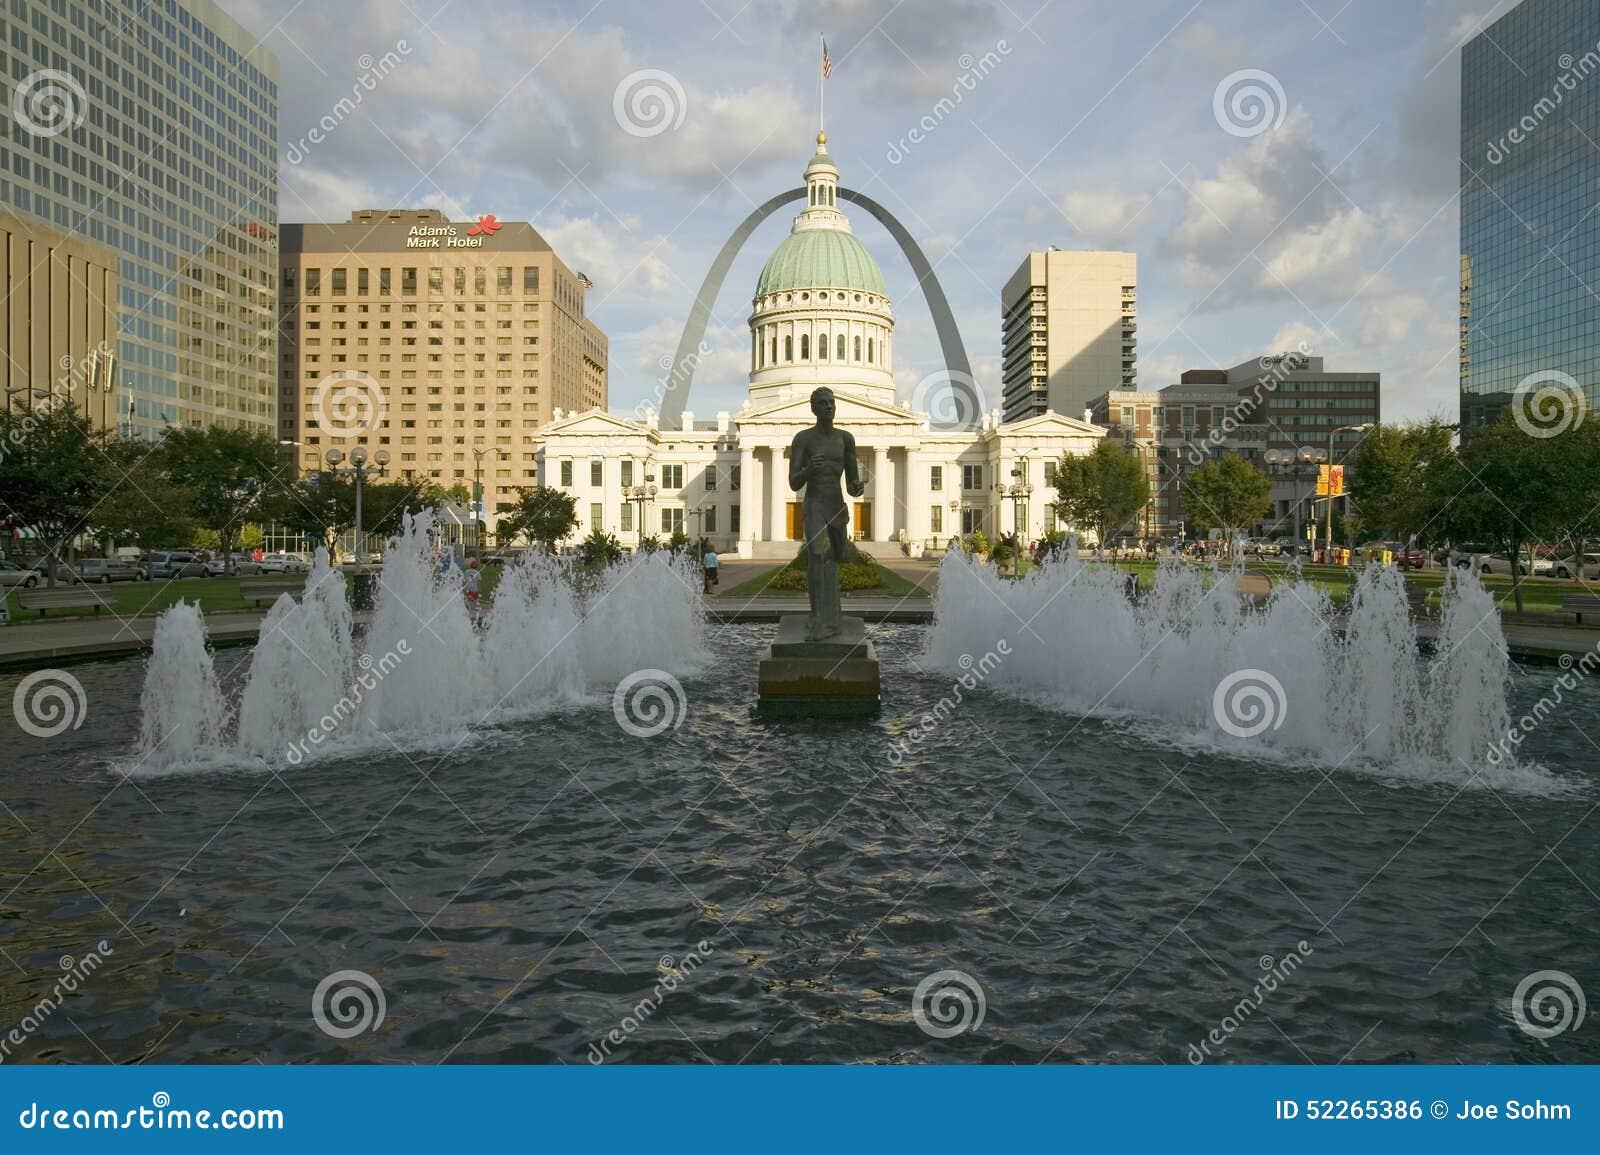 Kienerplein - ï ¿ ½ Runnerï ¿ ½ in waterfontein voor historisch Oud Hof Huis en Gatewayboog in St.Louis, Missouri